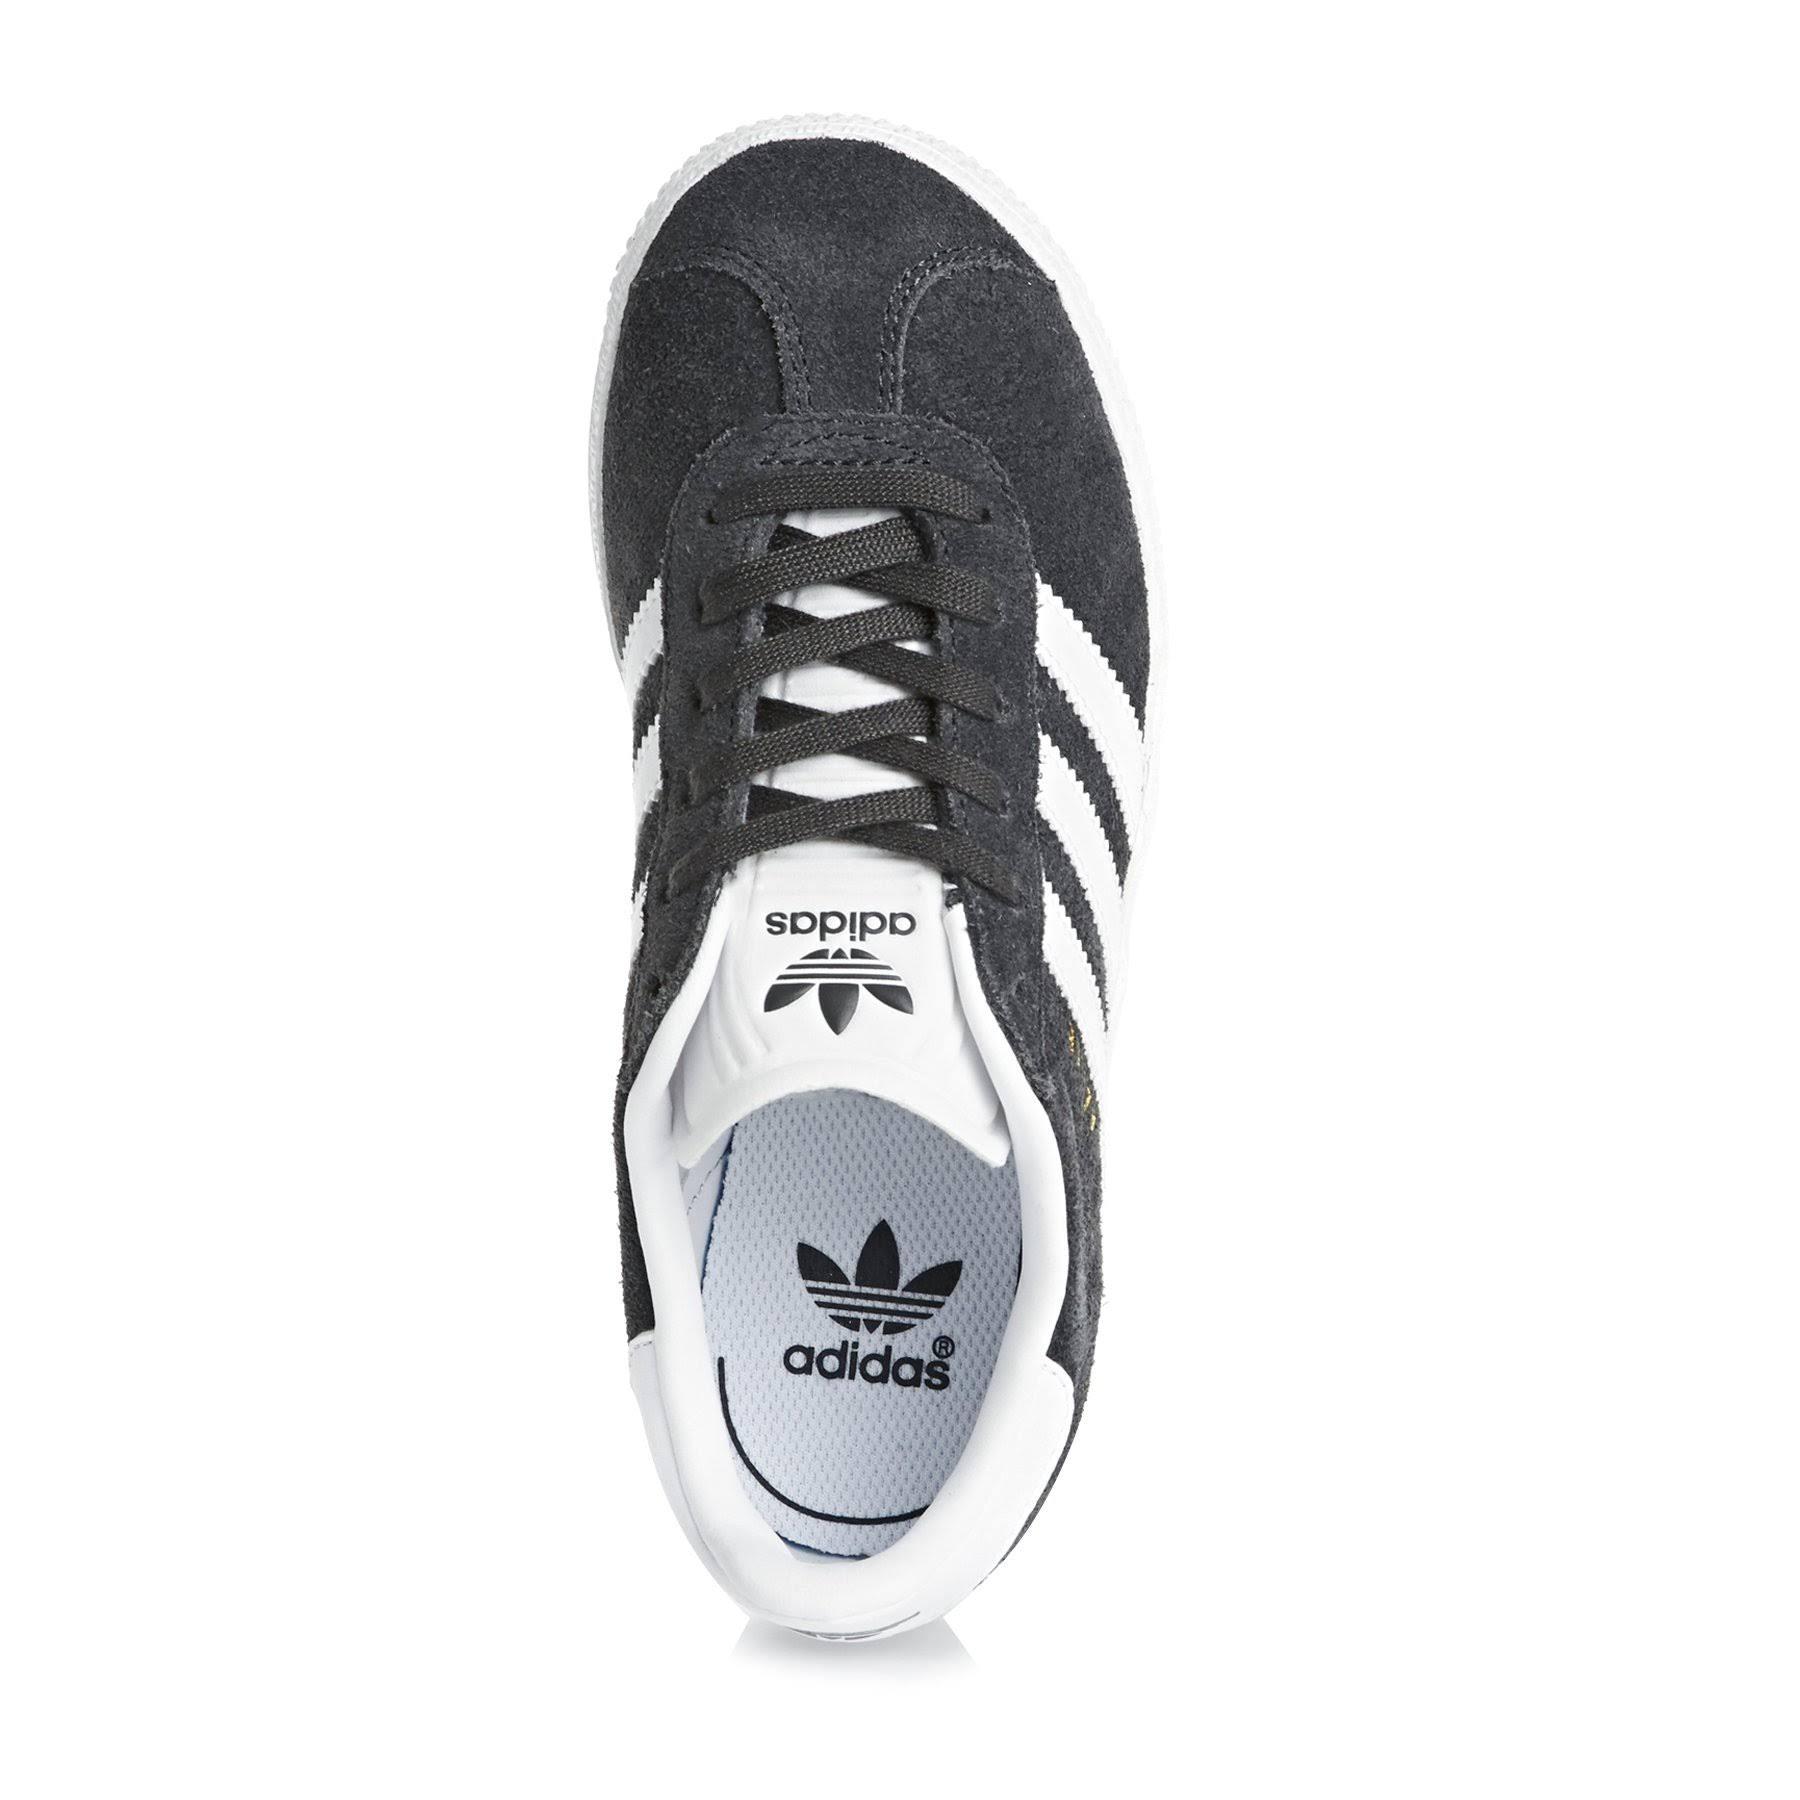 Gazelle Gazelle Shoes Gazelle Adidas Adidas Adidas Grey Shoes Grey g7vYbyf6